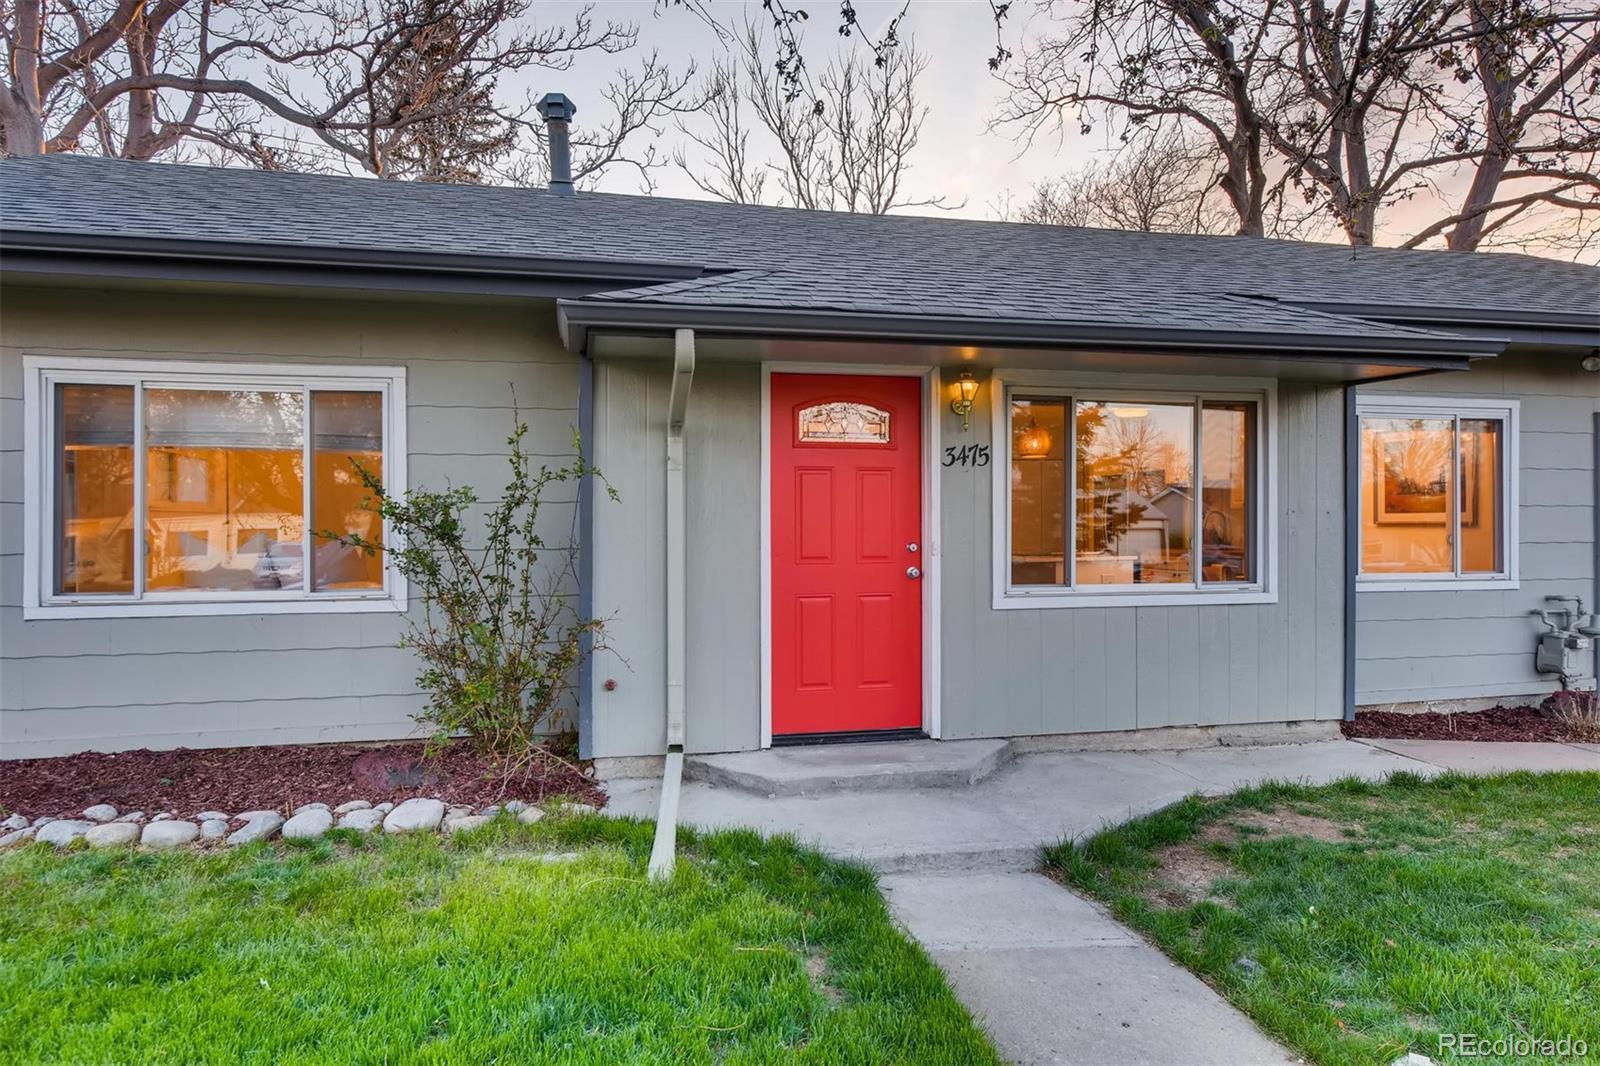 3475 S Forest Street Property Photo - Denver, CO real estate listing